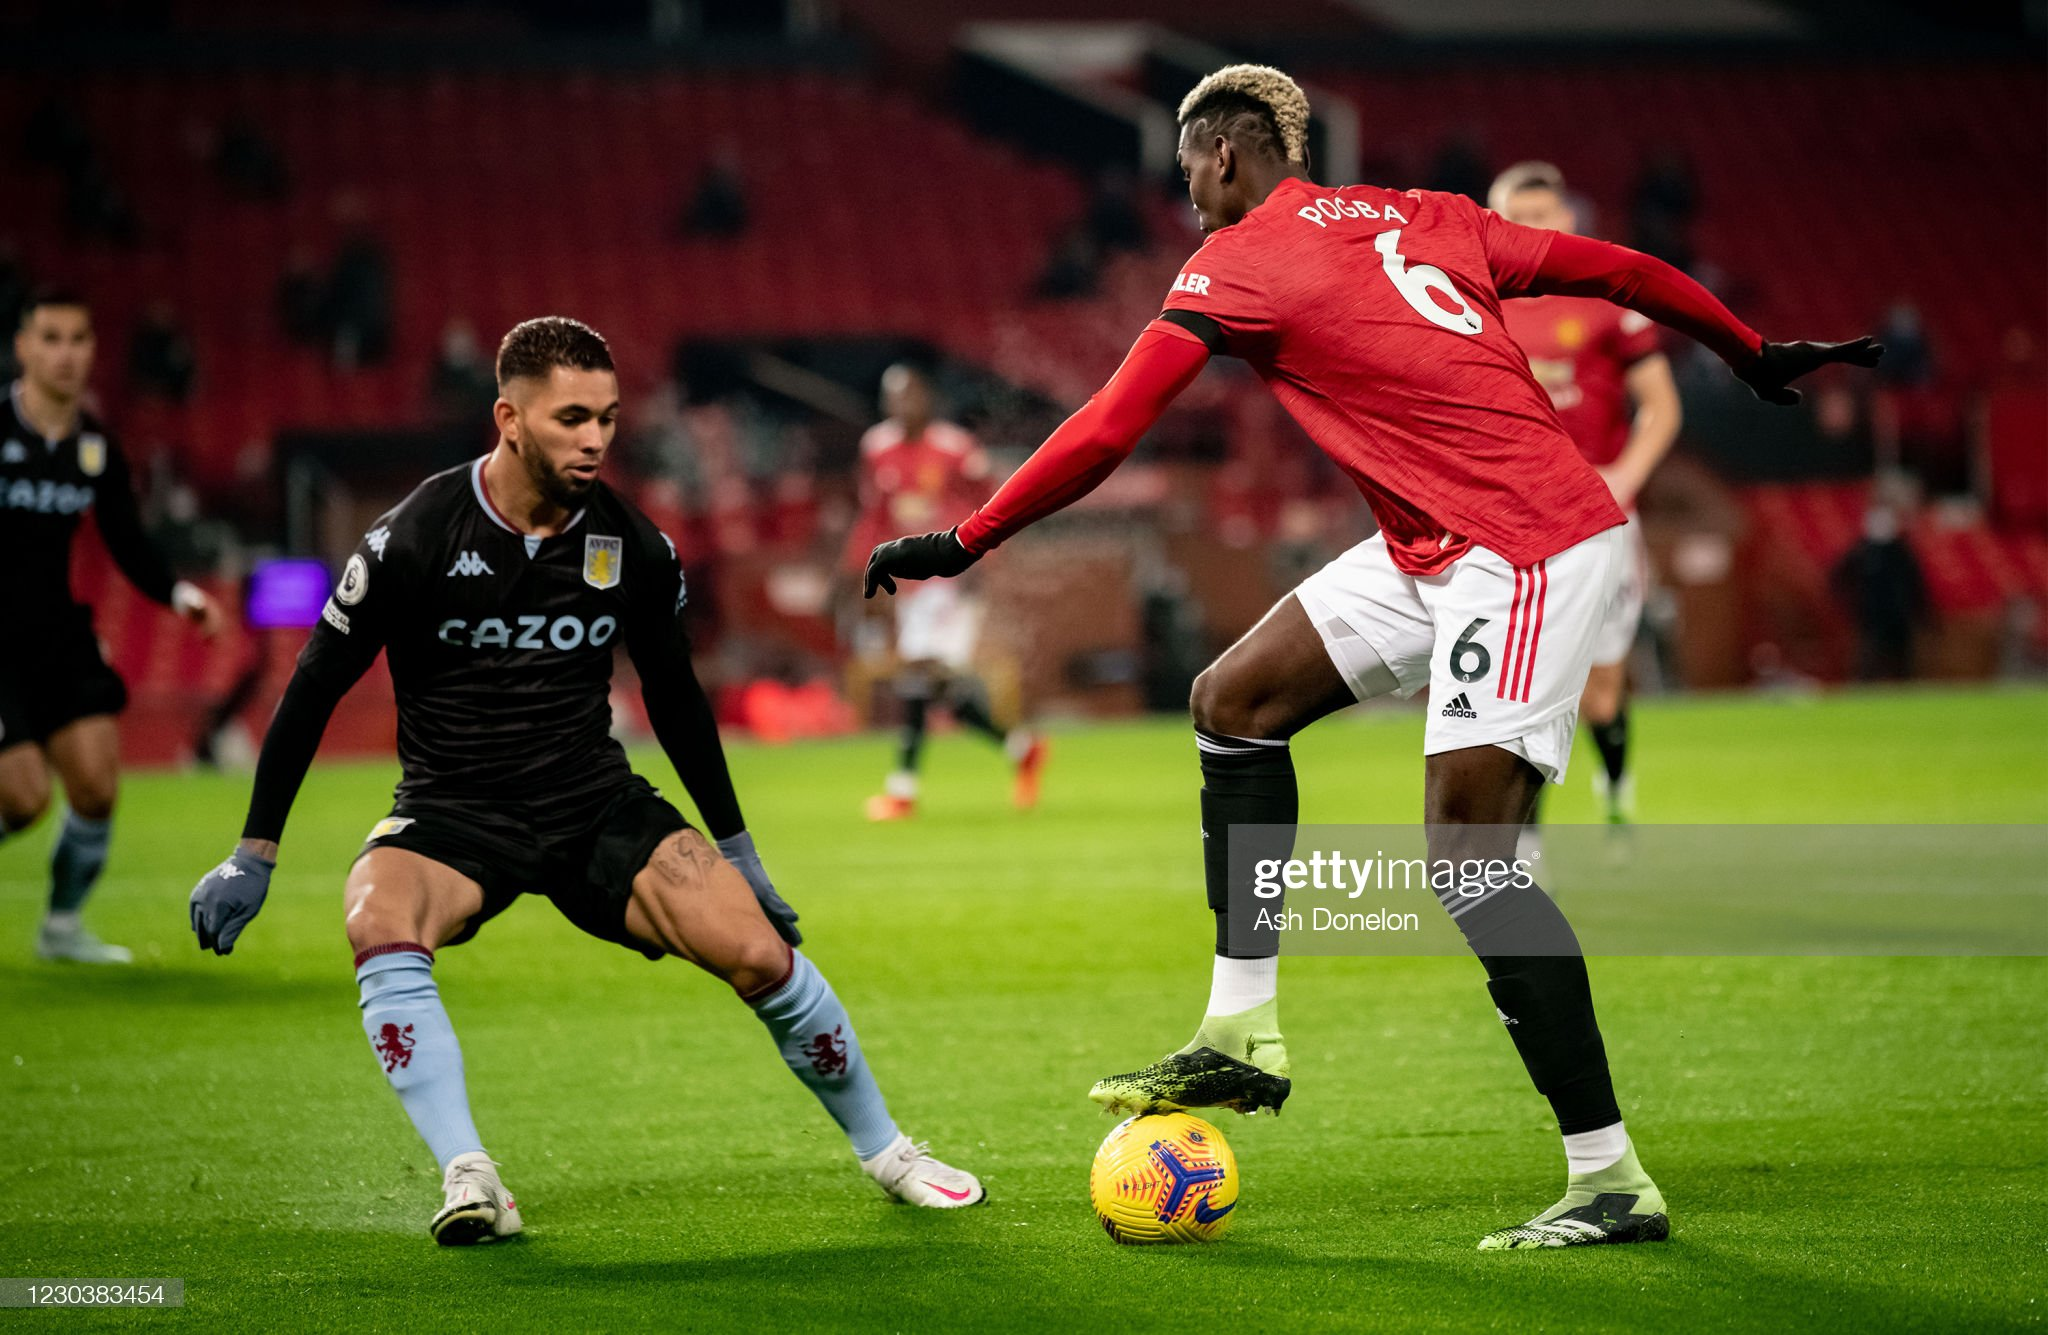 Aston Villa vs Manchester United preview, prediction and odds